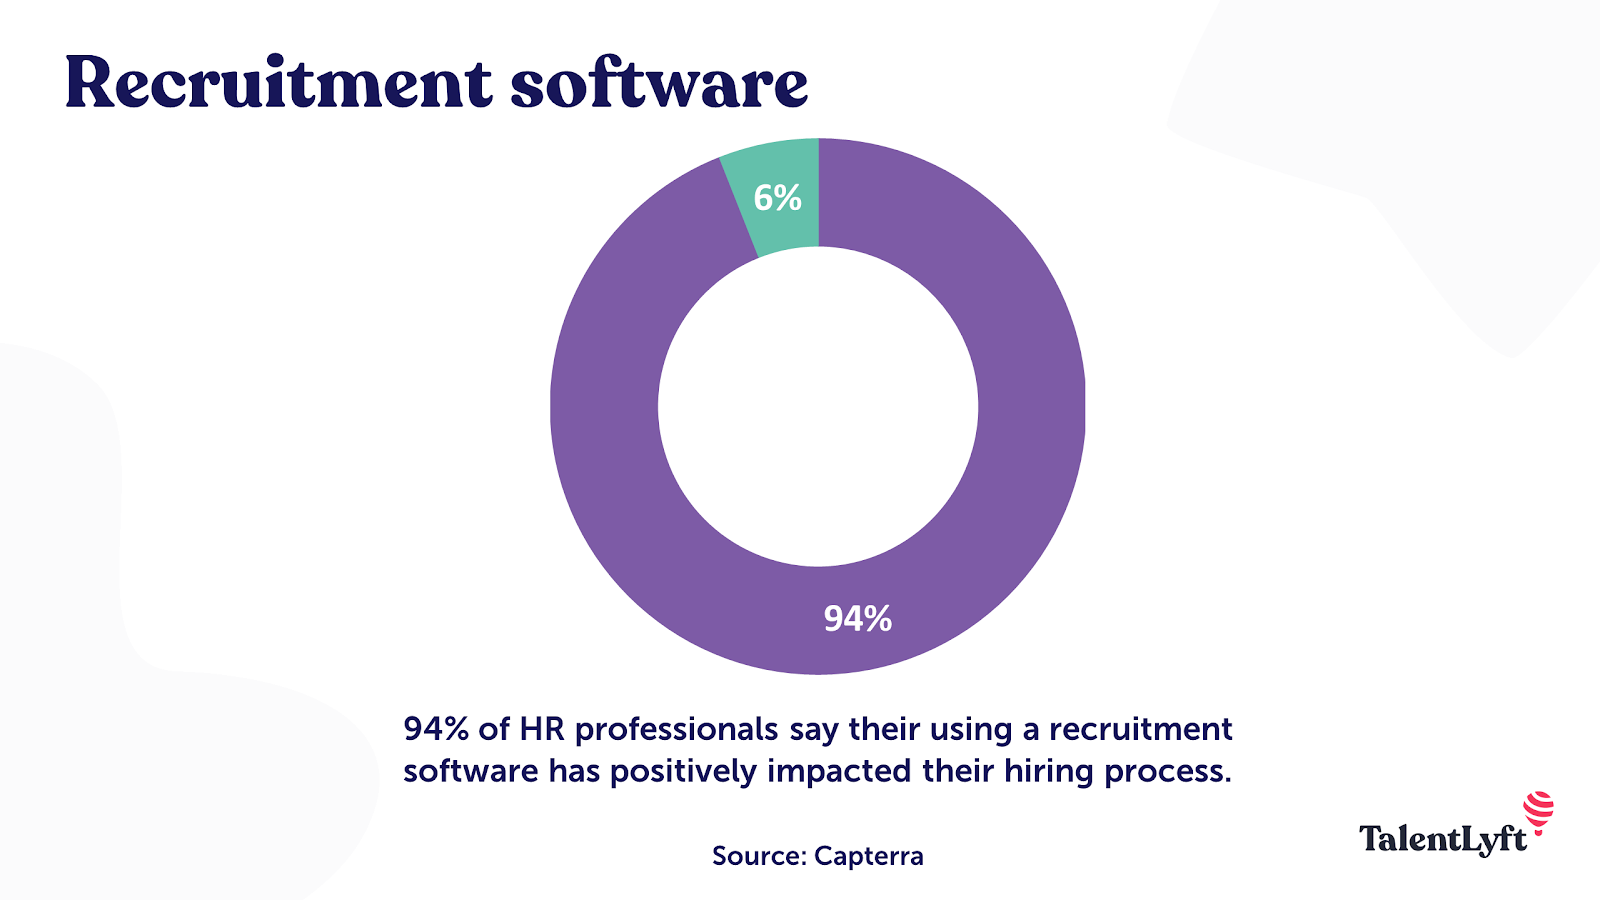 Recruitment software statistic benefits